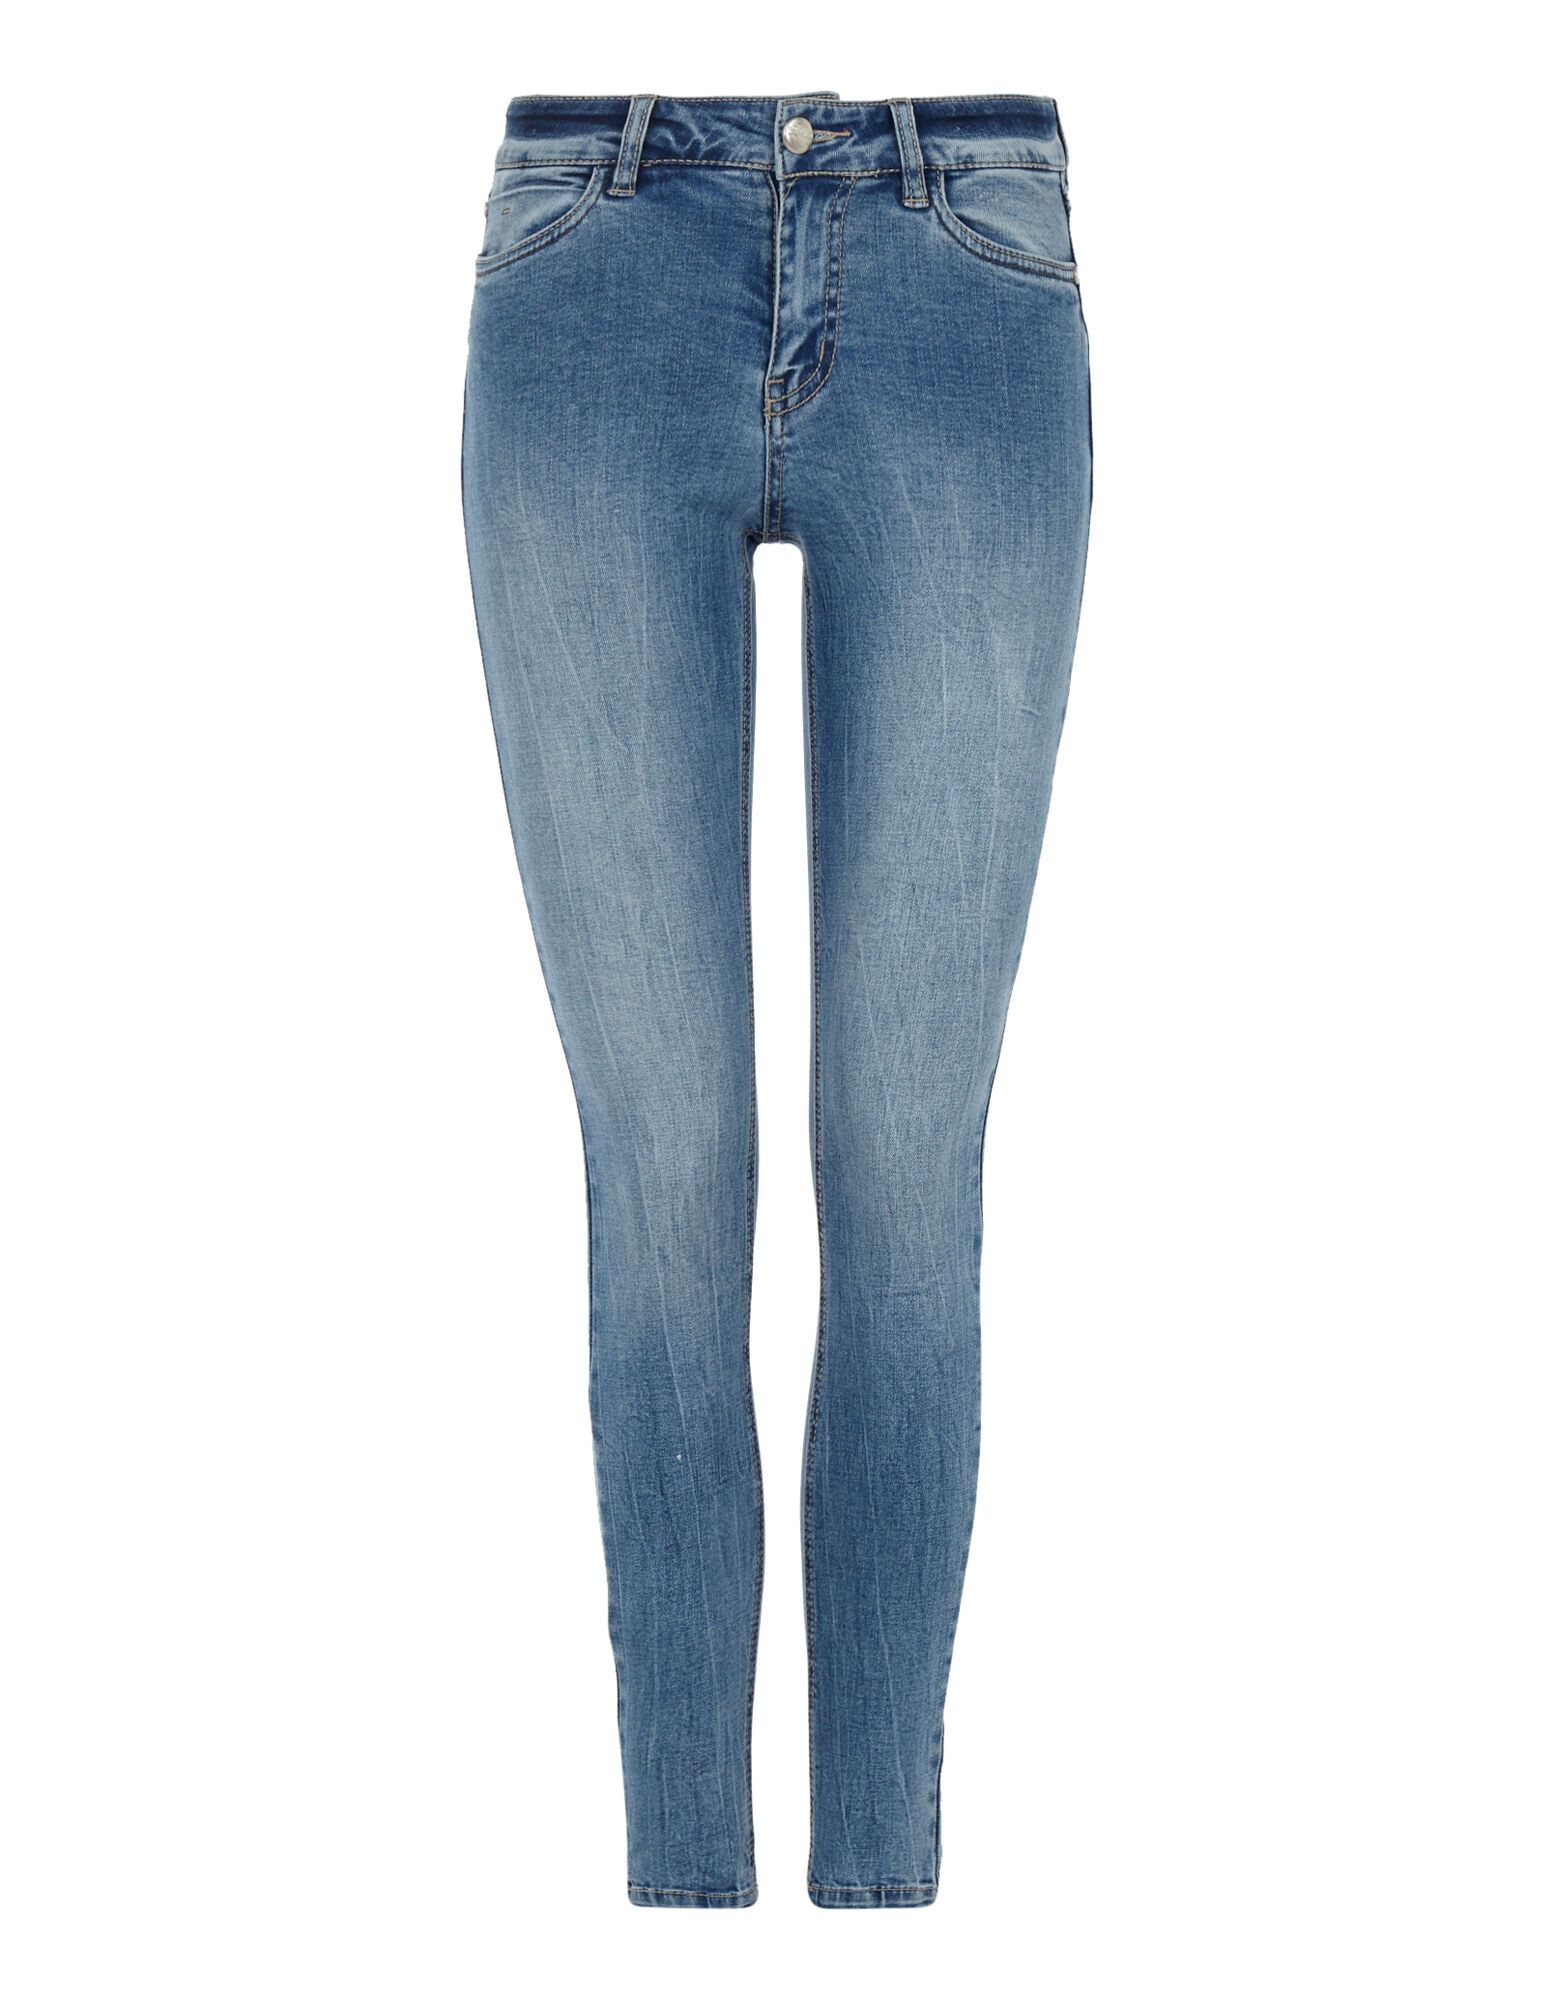 Damen Skinny Jeans günstig kaufen✓ Takko Fashion